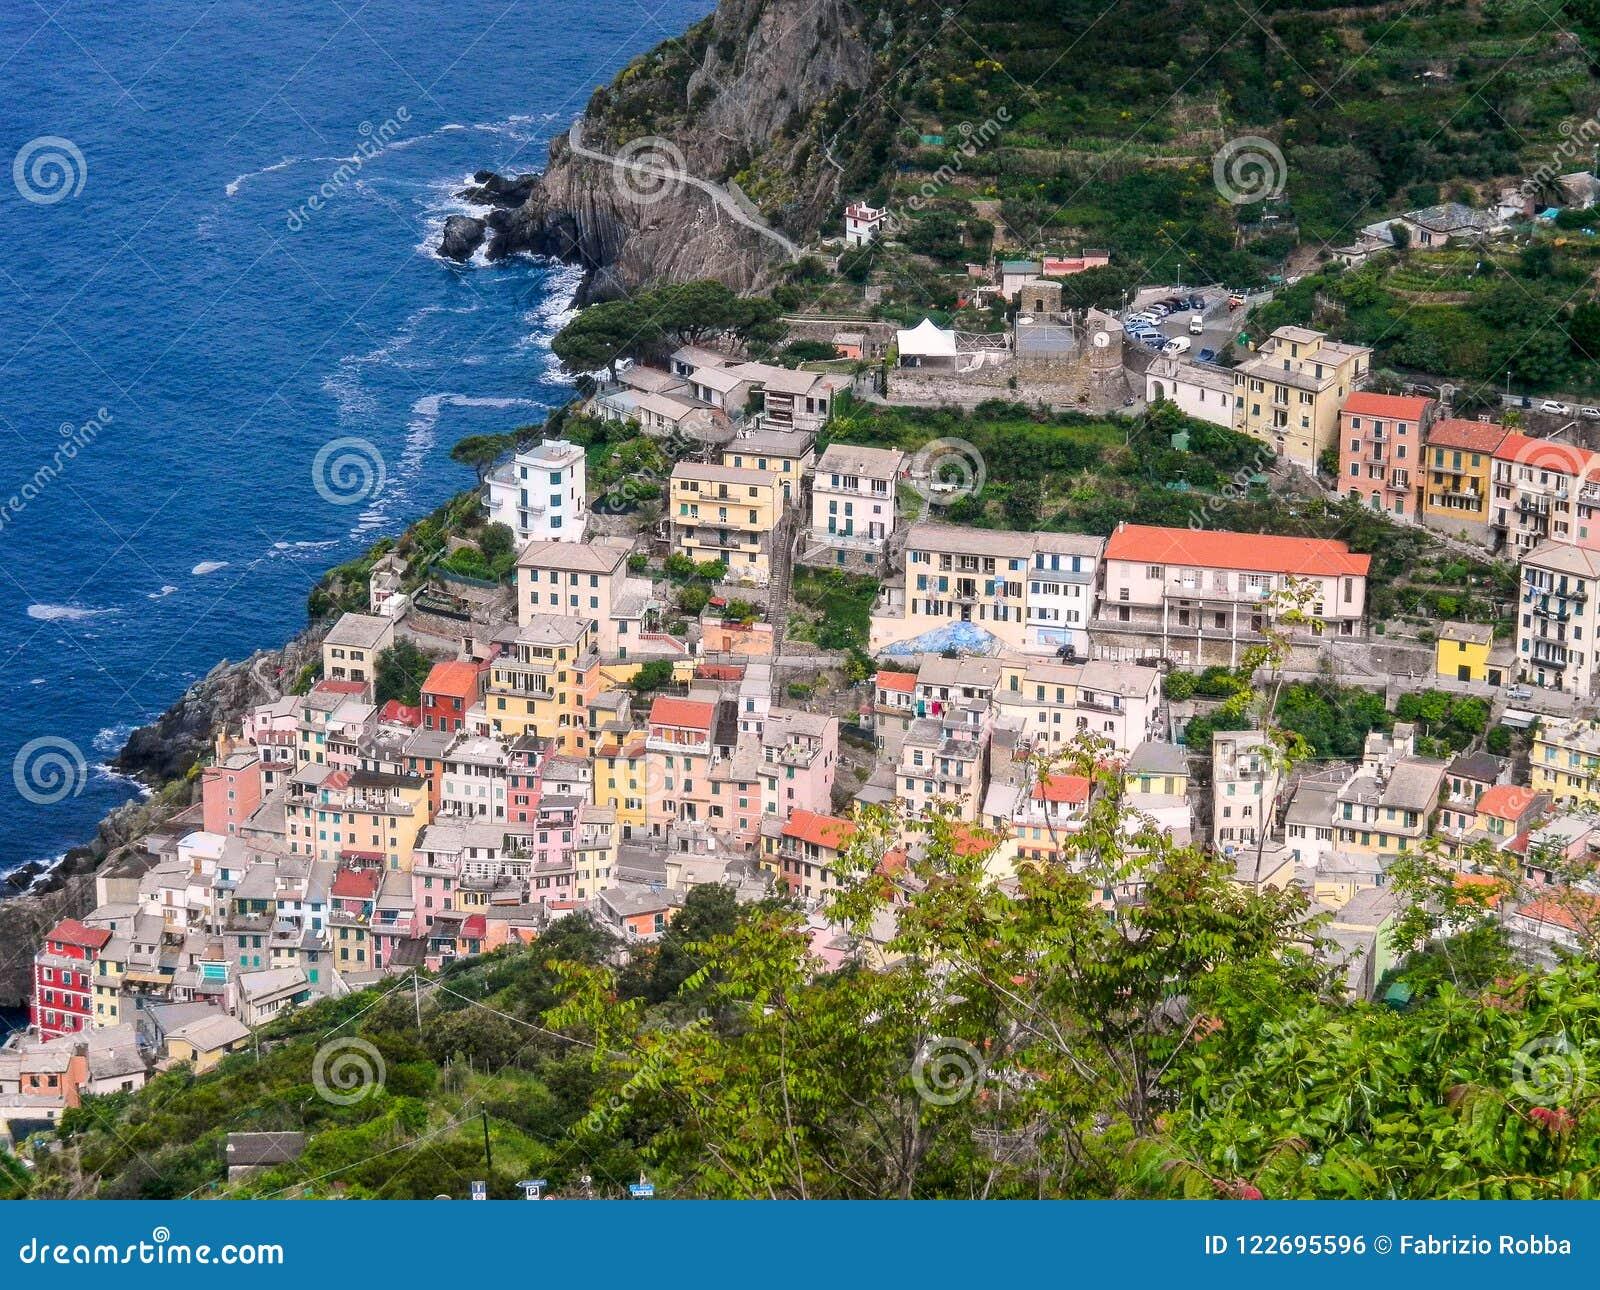 Luchtmening van Riomaggiore, Cinque Terre, de Provincie van La Spezia, Italië